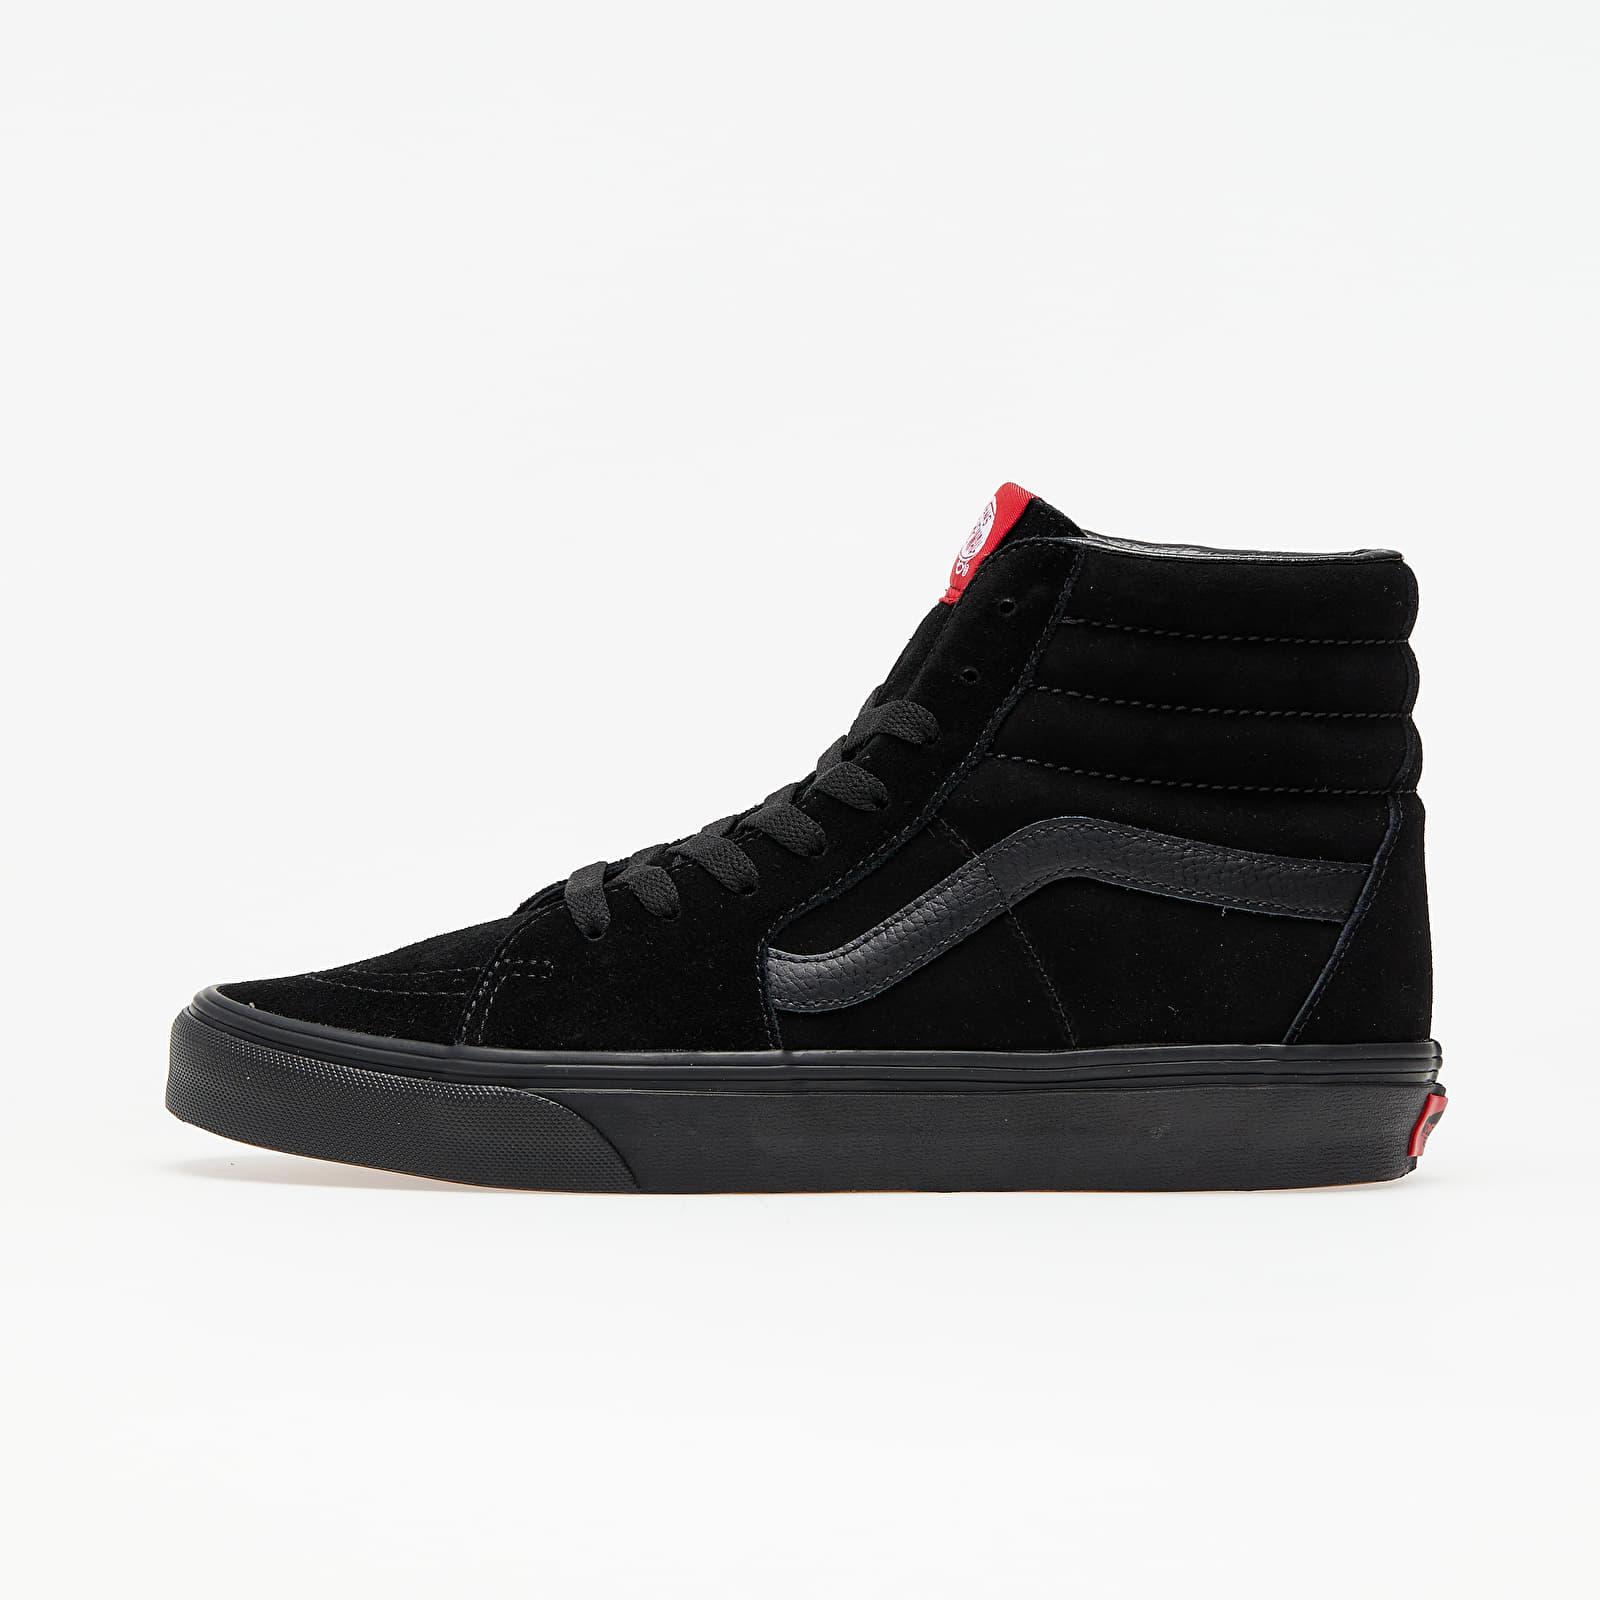 Vans Sk8-Hi Black/ Black Suede EUR 40.5